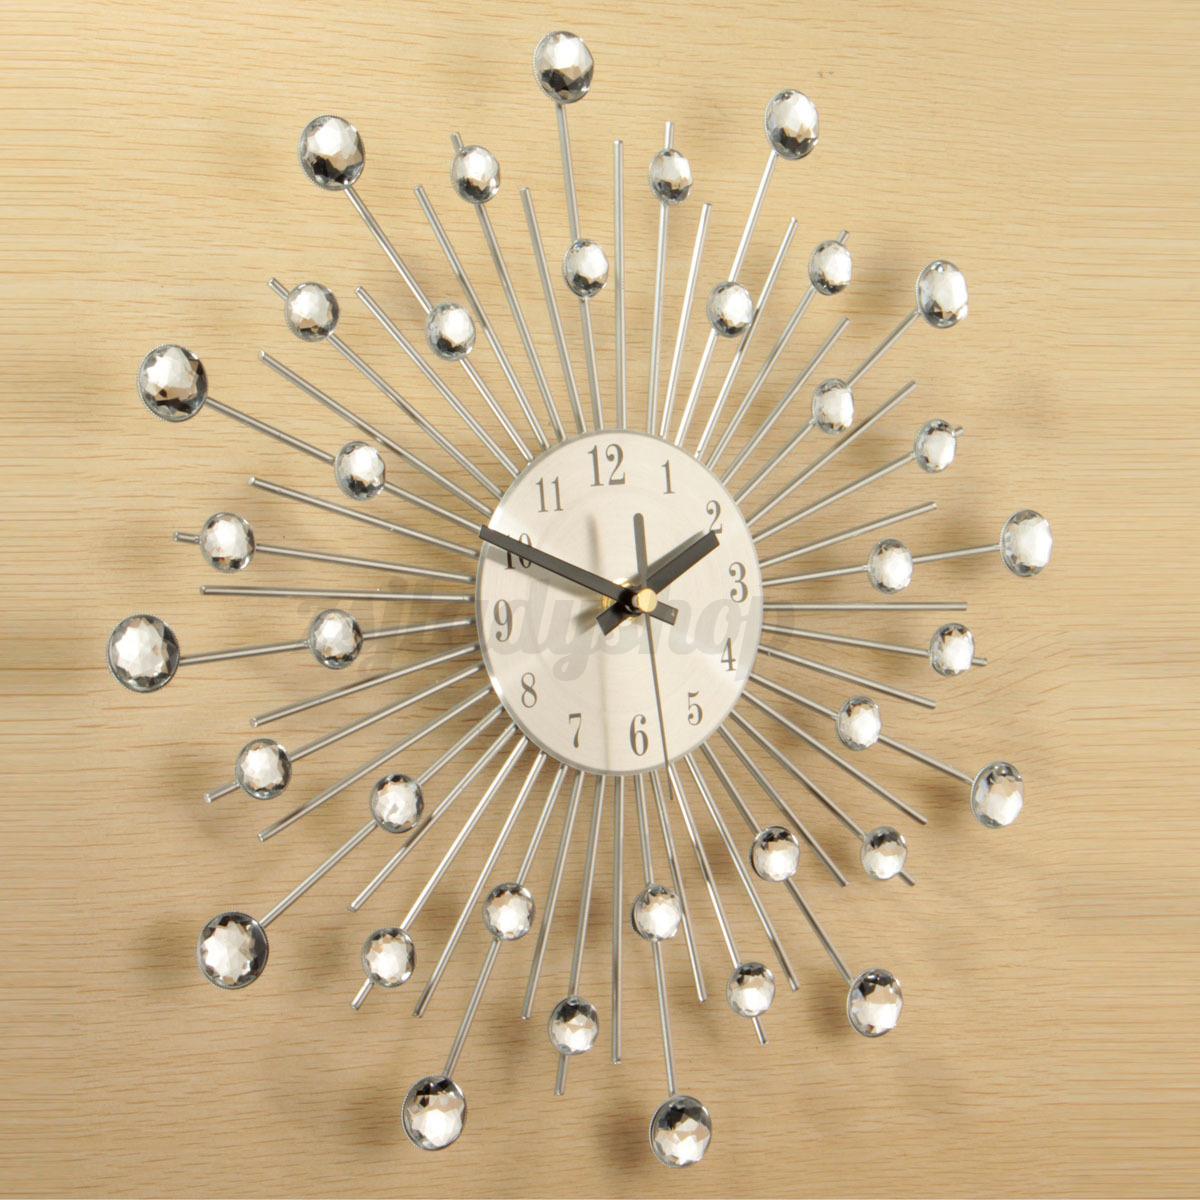 Diy sunburst wall decor : Modern art large wall clock metal sunburst home decor diy